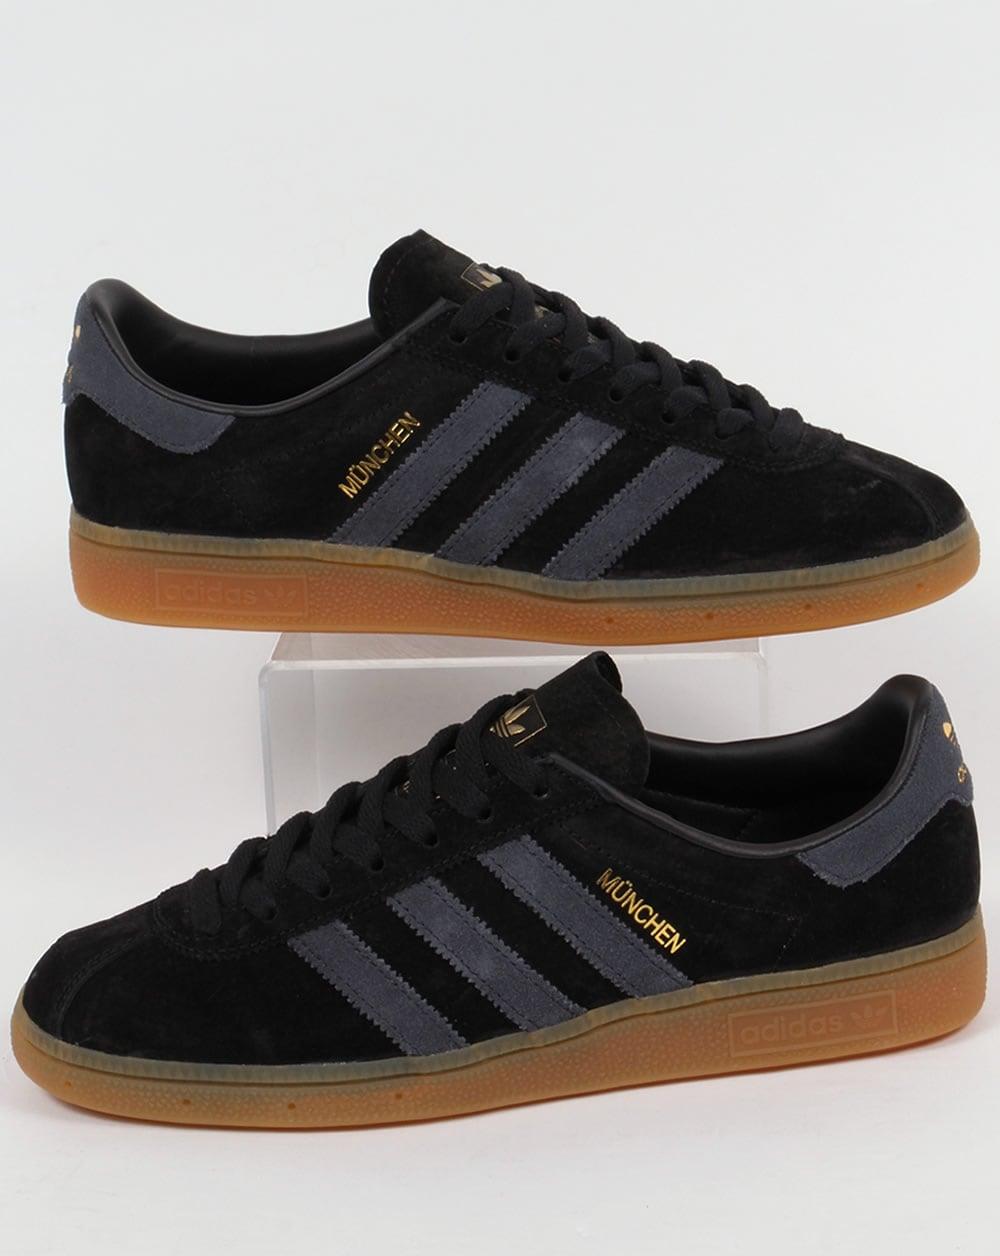 Molestar regalo Asumir  Adidas Munchen Trainers Black/Dark Grey,shoes,originals,mens